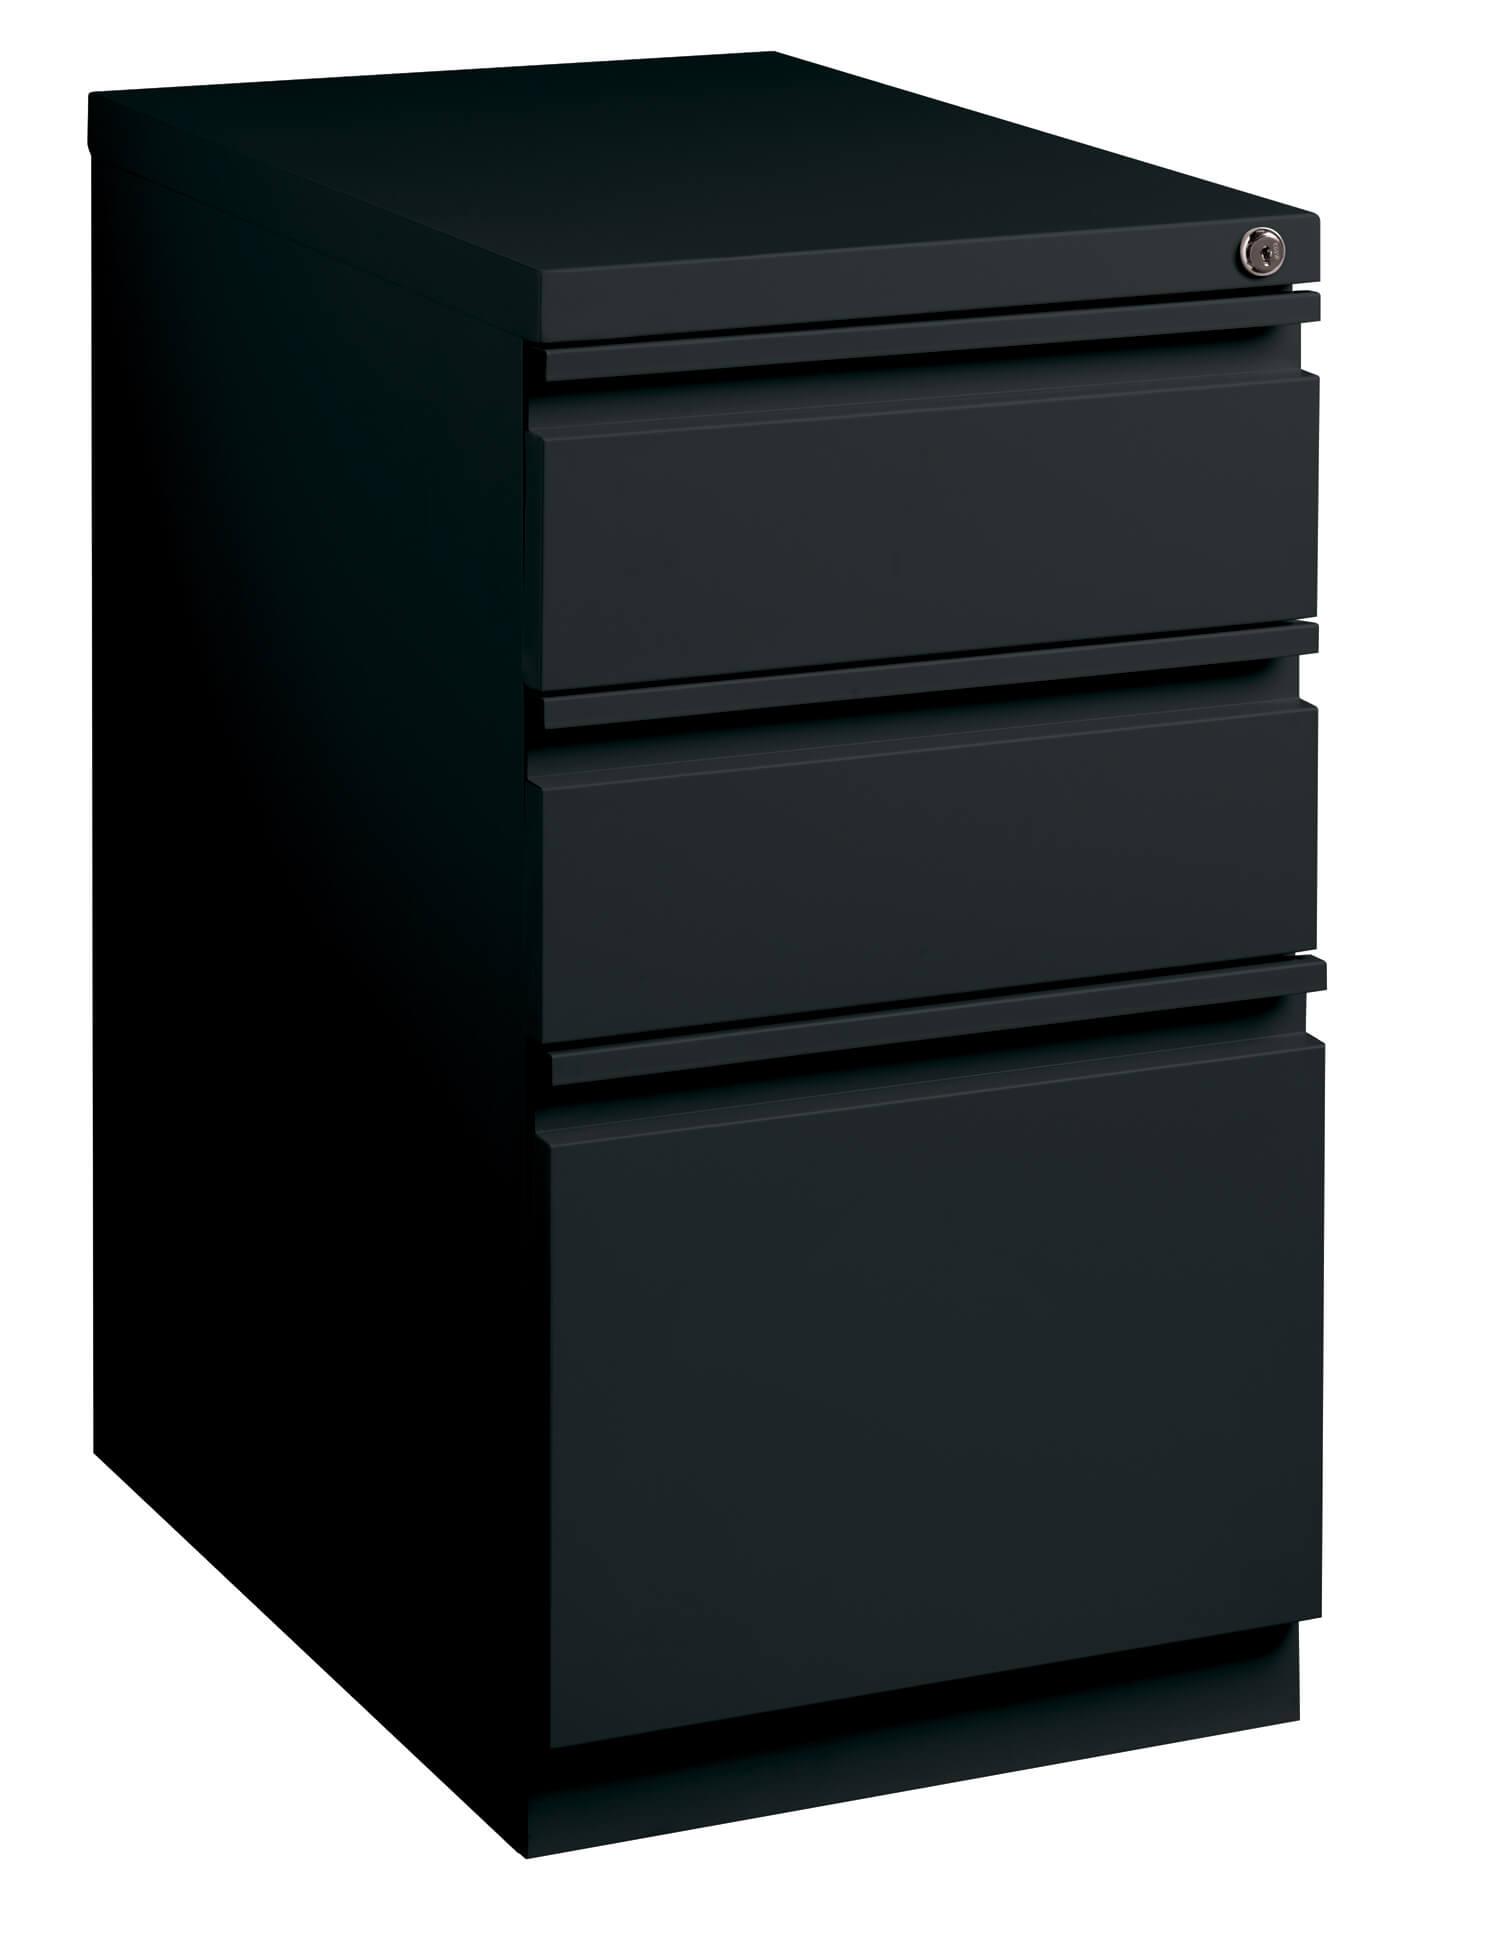 HIRSH INDUSTRIES PEDESTAL metal filing cabinet